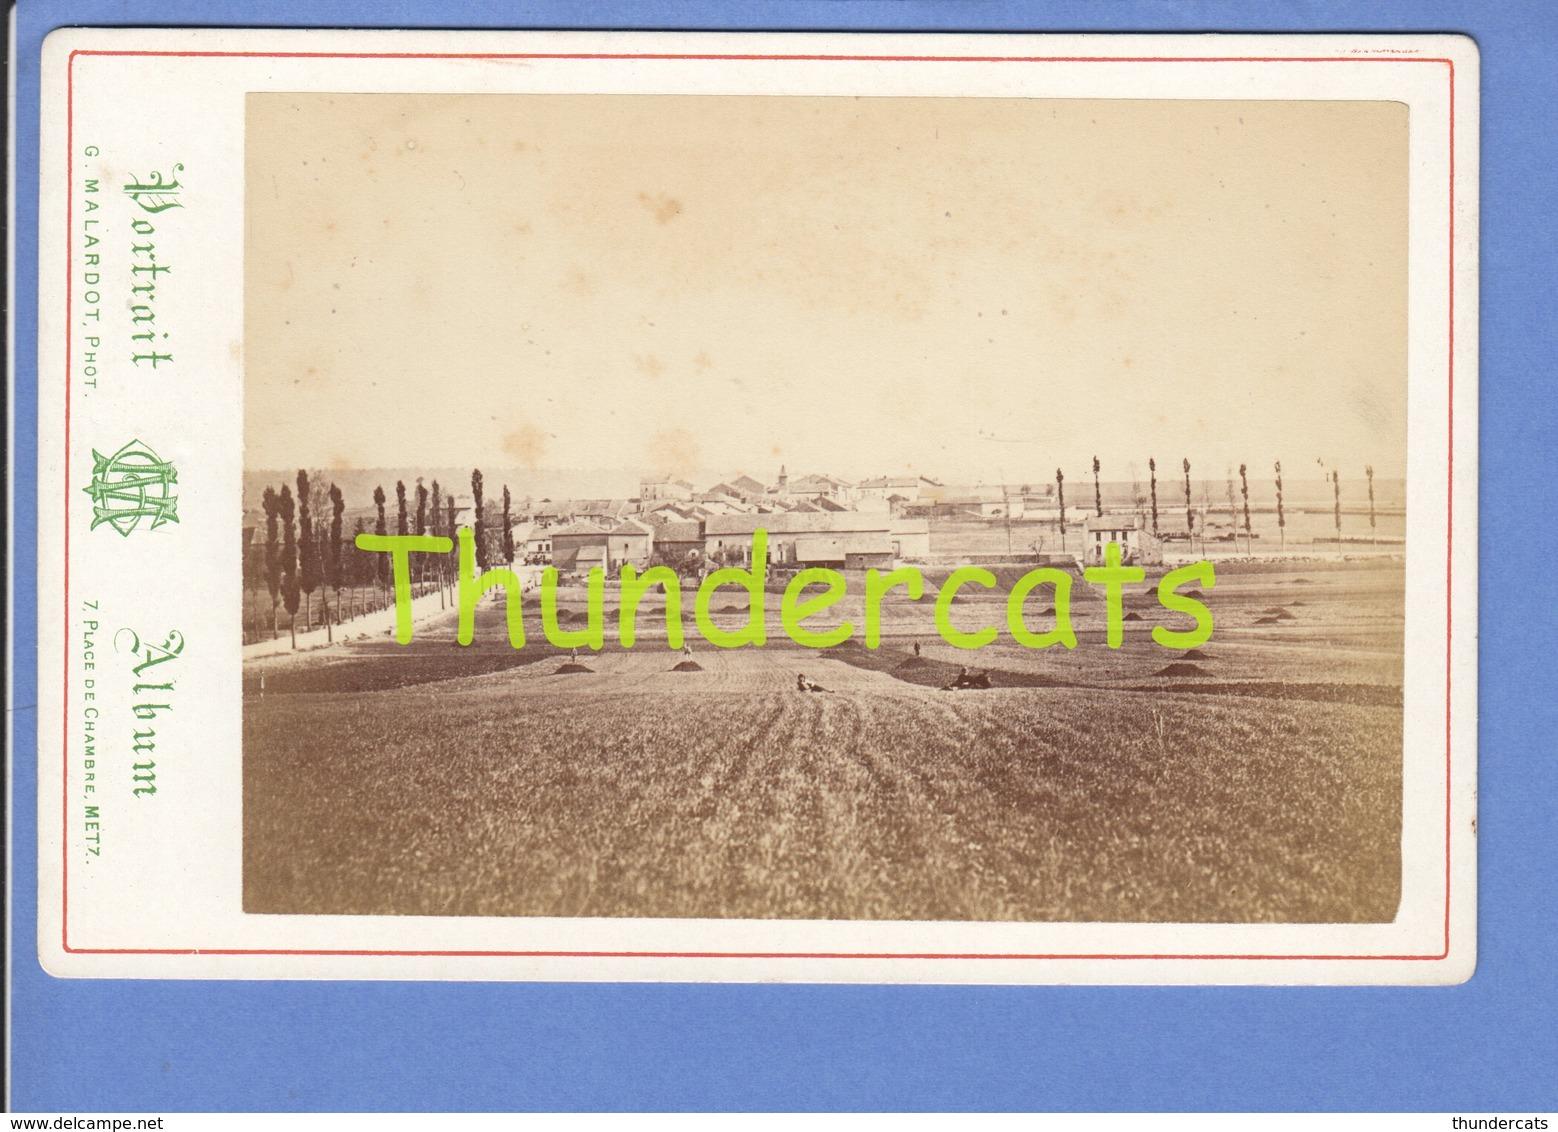 GRAND PHOTO DE CABINET 16cm X 11 Cm METZ MALARDOT GRAVELOTTE - Ancianas (antes De 1900)